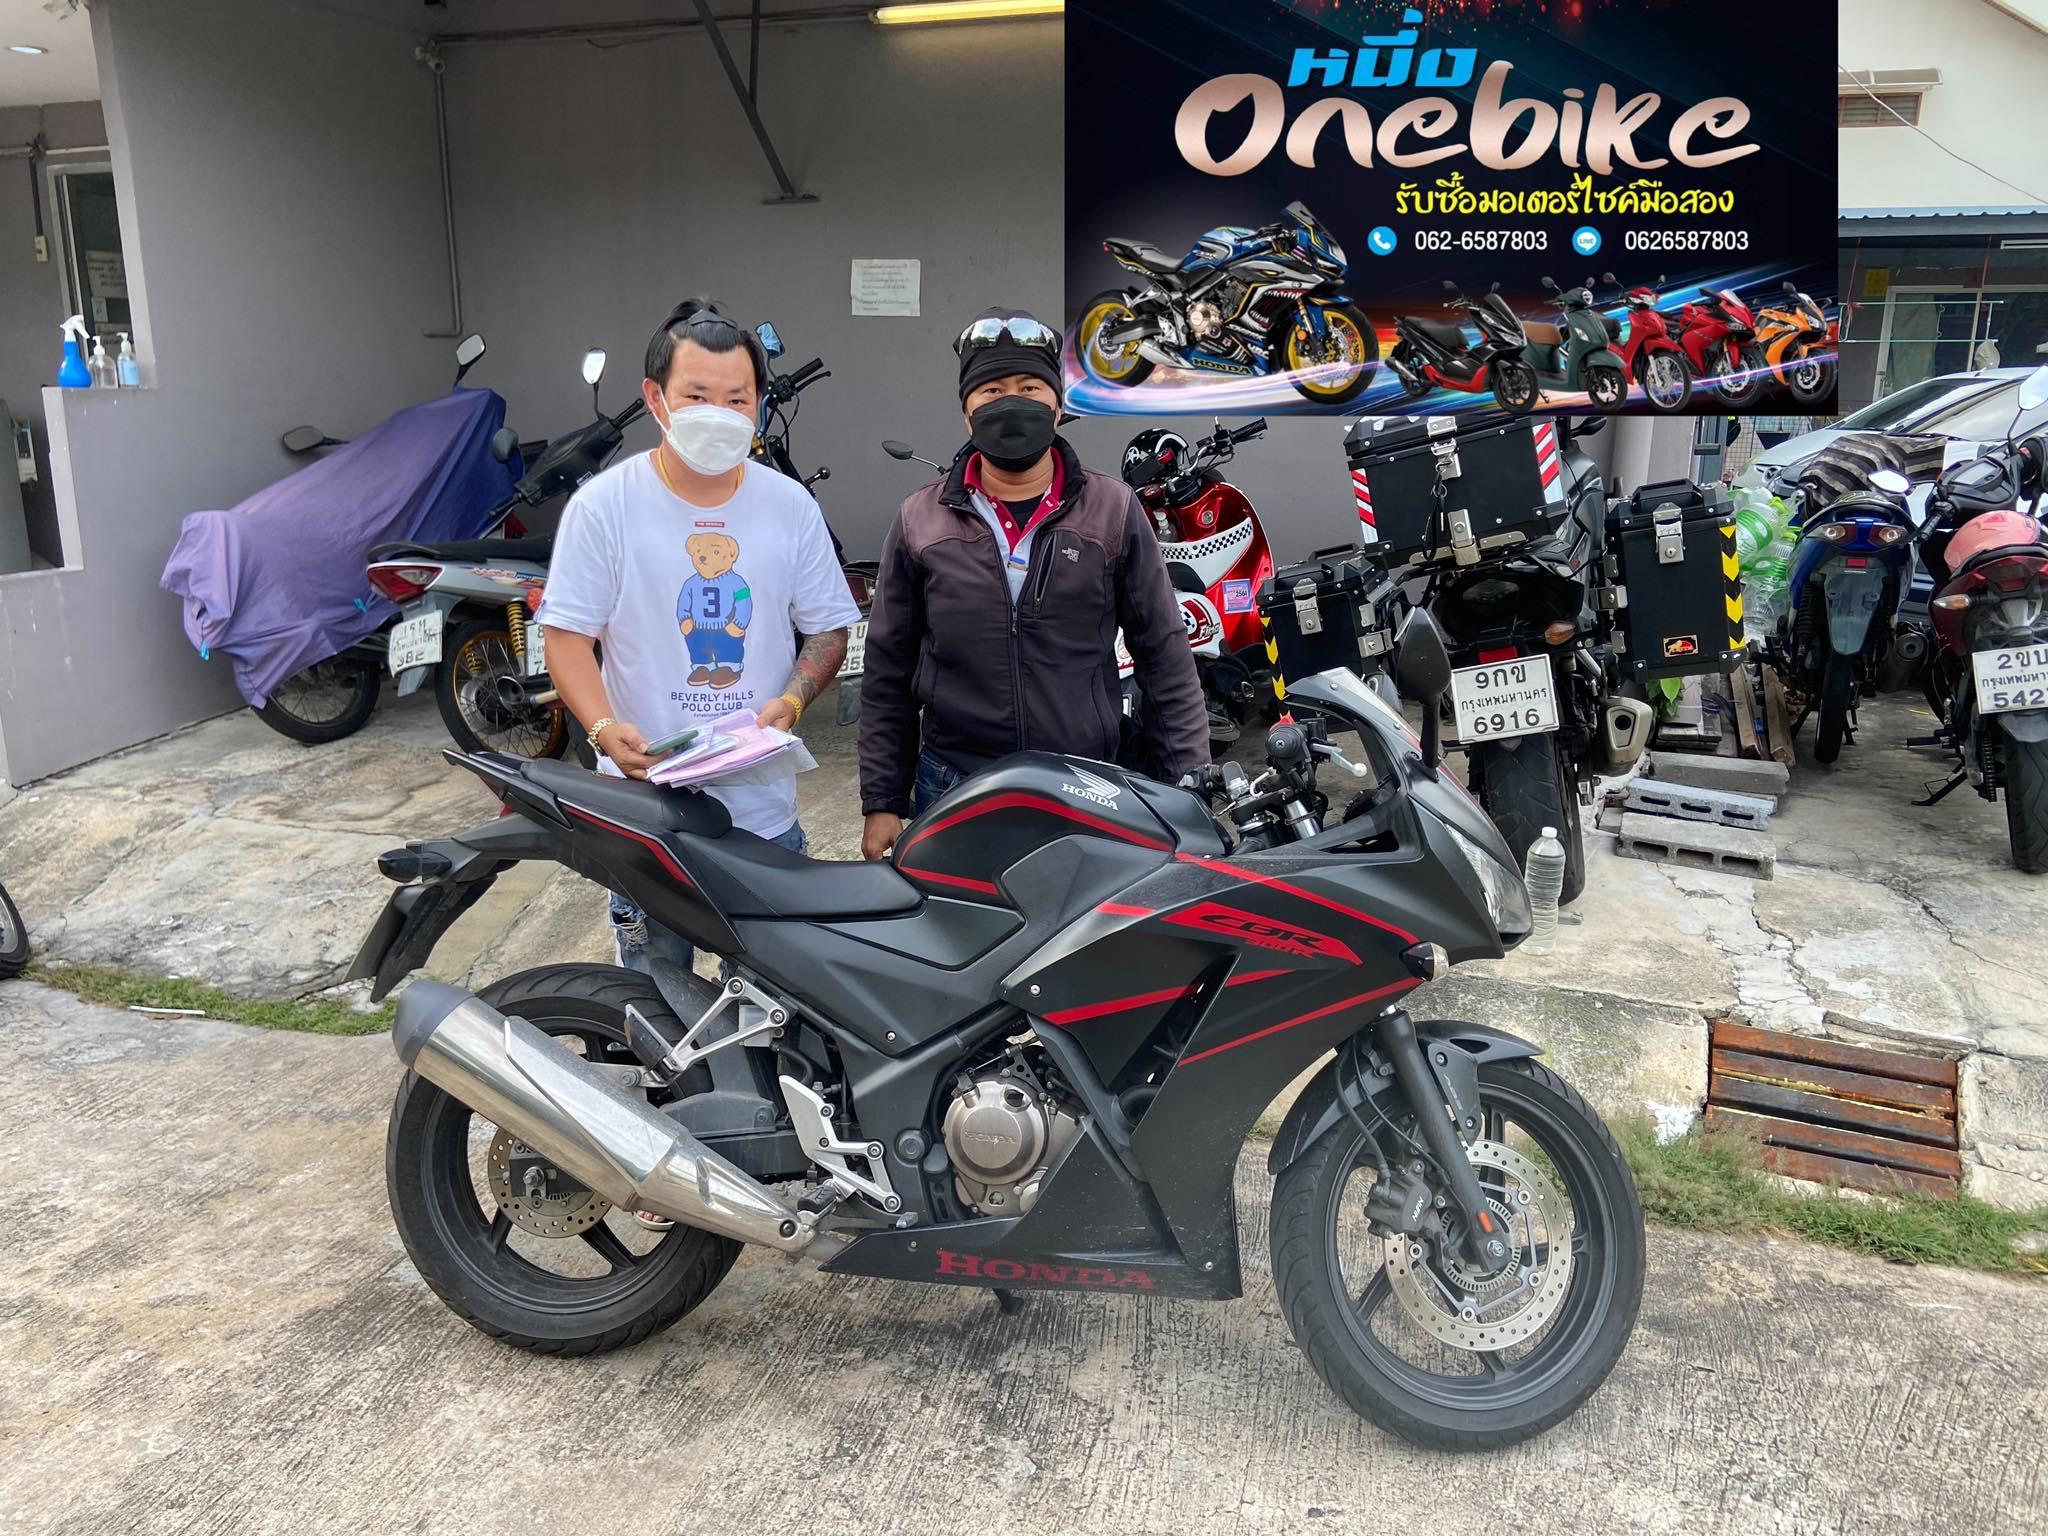 ONEBIKE รับซื้อมอเตอร์ไซค์นนทบุรี